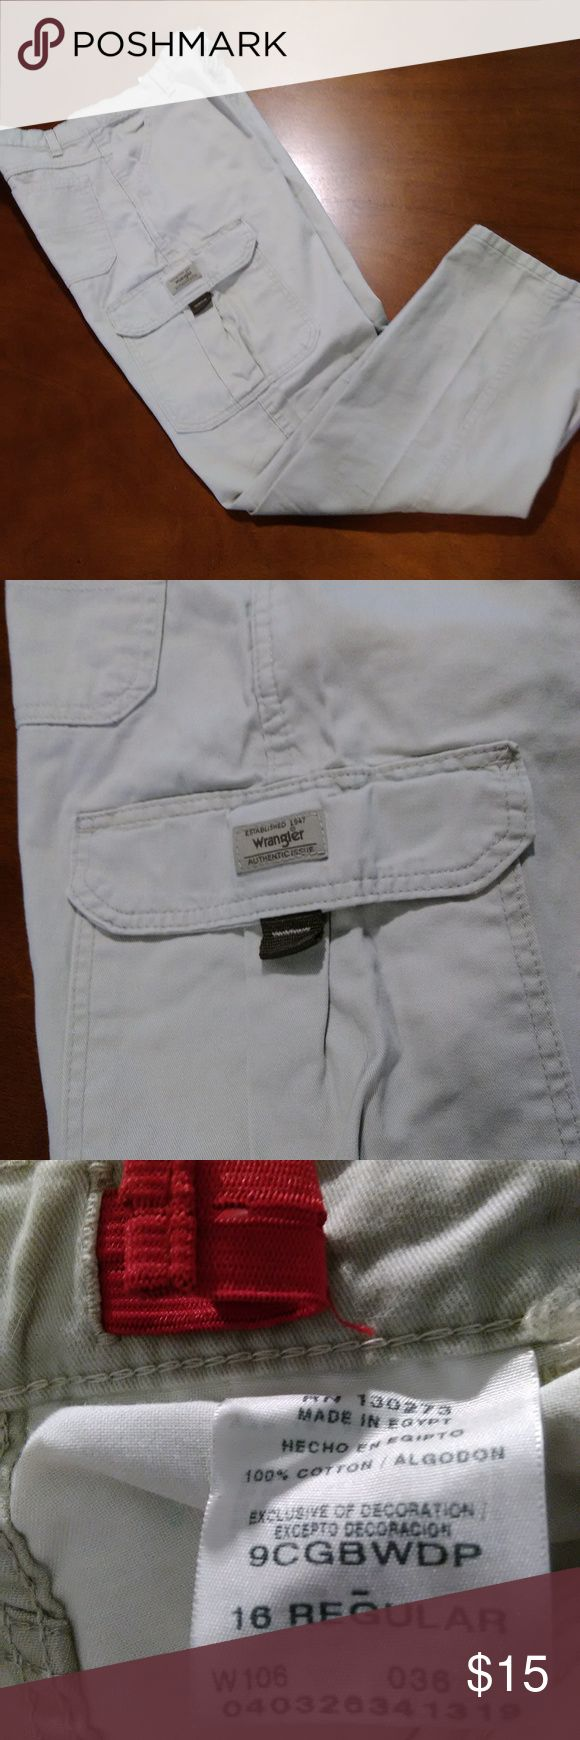 "Boy's Wrangler Khaki Cargo Pants Size 16R EUC nice cargo pants. Inseam 29"". Smoke free/ pet free Wrangler Bottoms Casual"